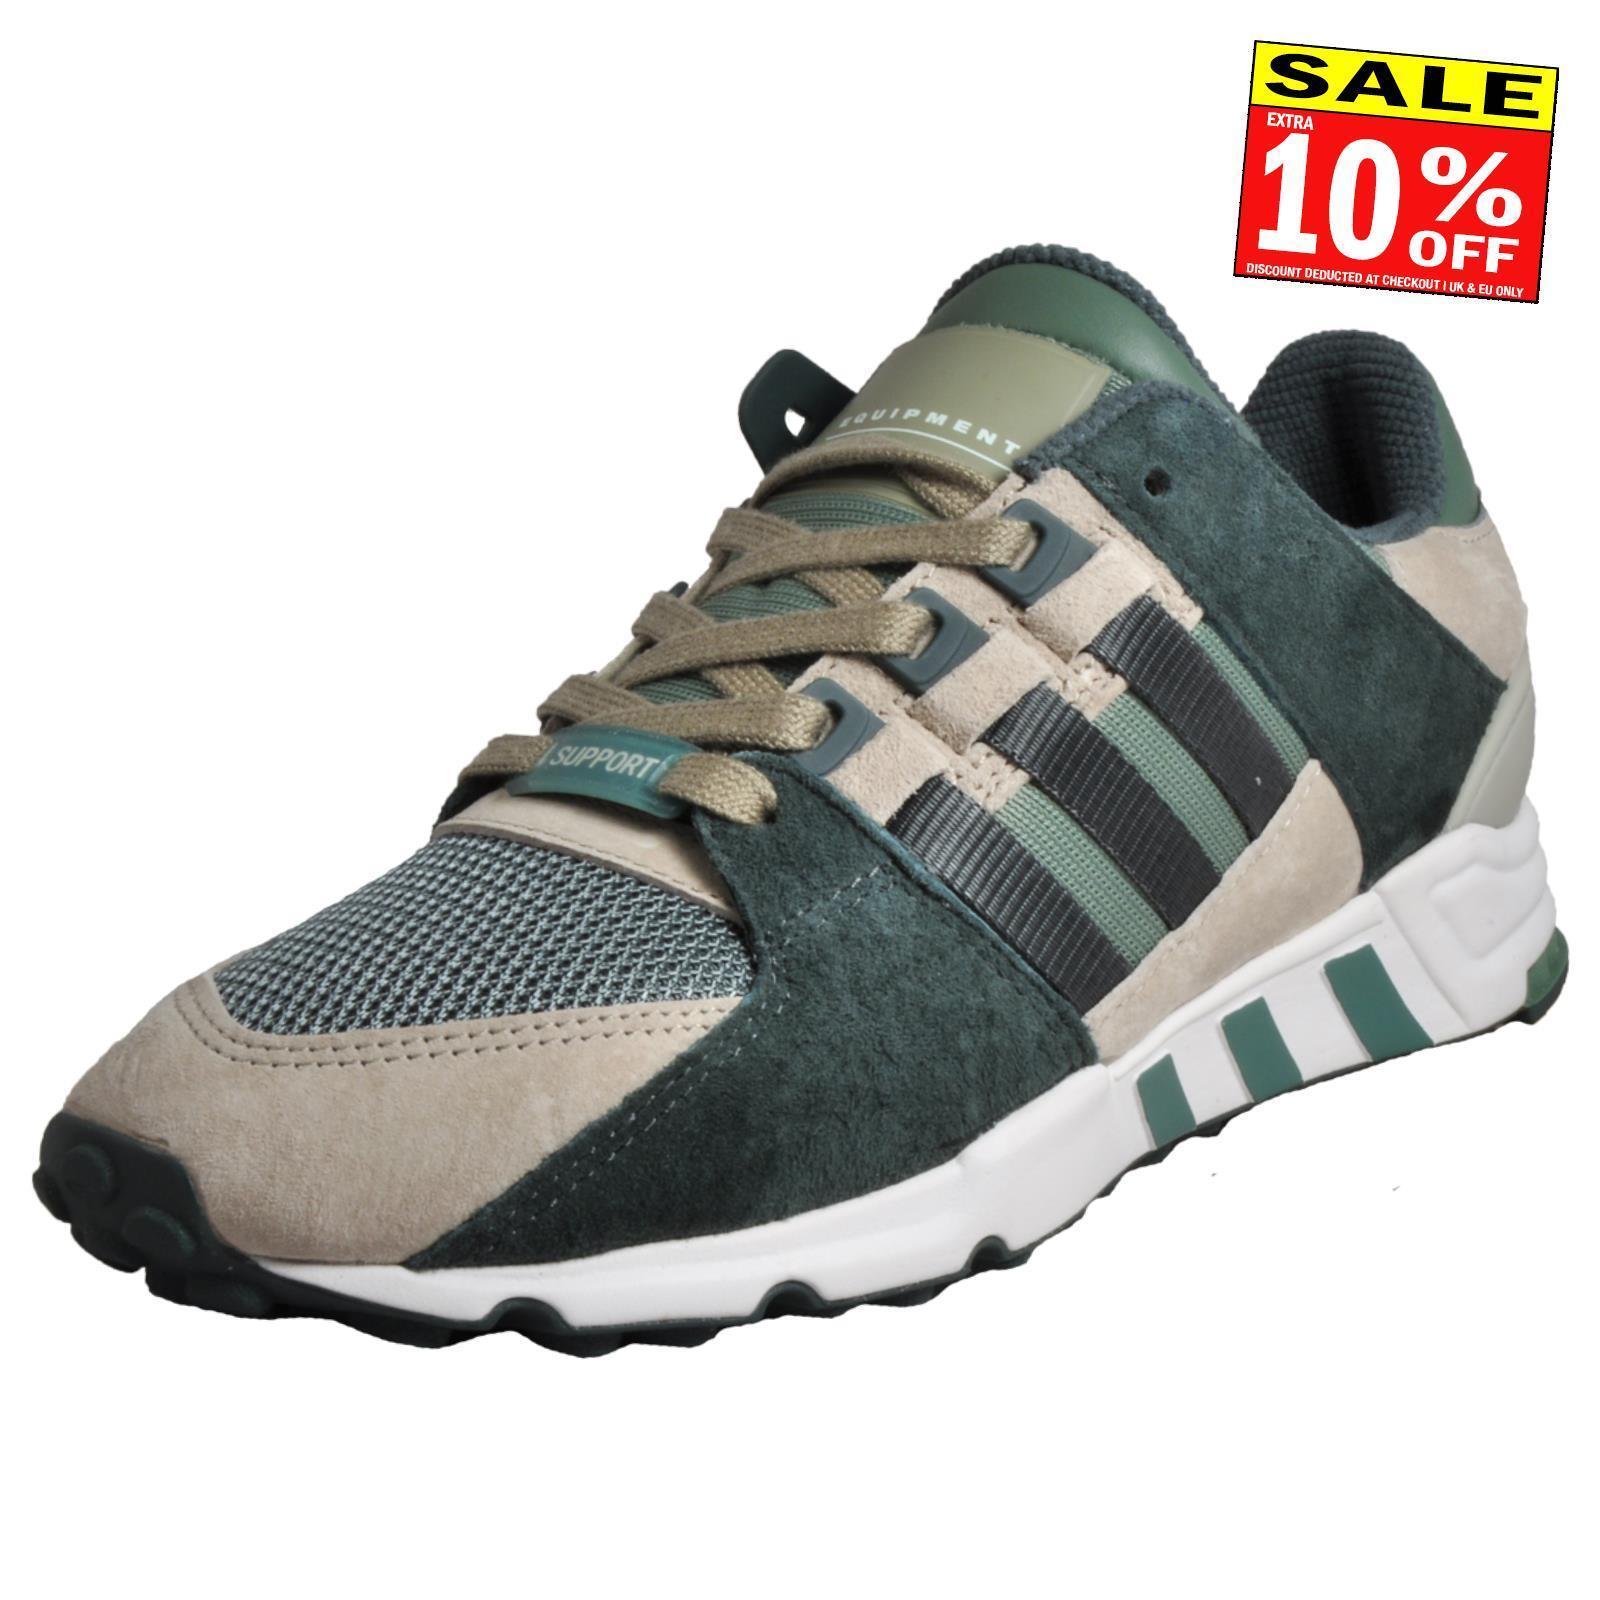 Adidas Originals EQT Support RF Men's Classic Retro Fashion Trainers Green